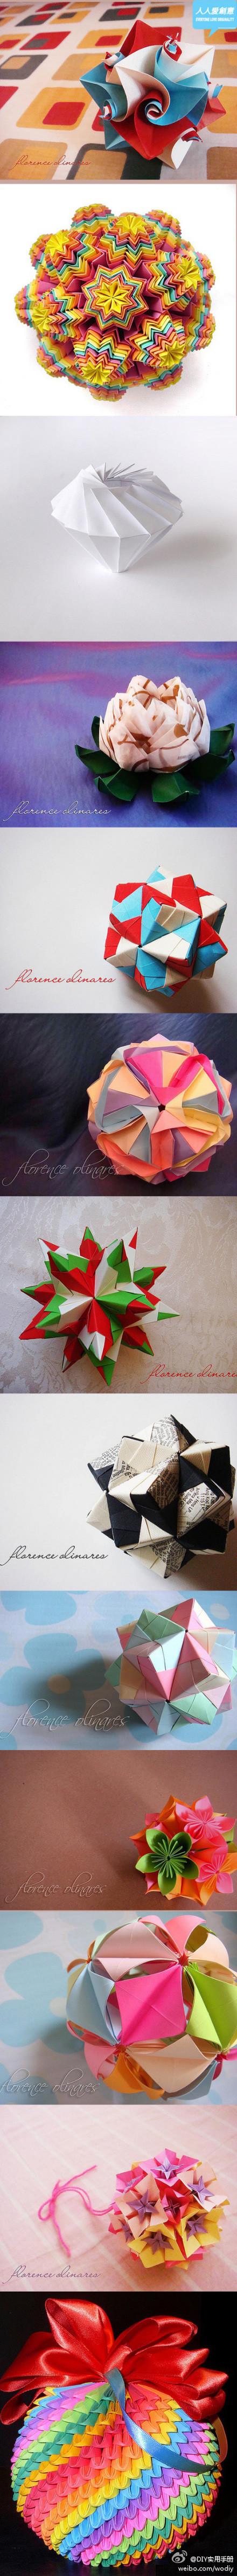 paper folding - modular origami - love this stuff!